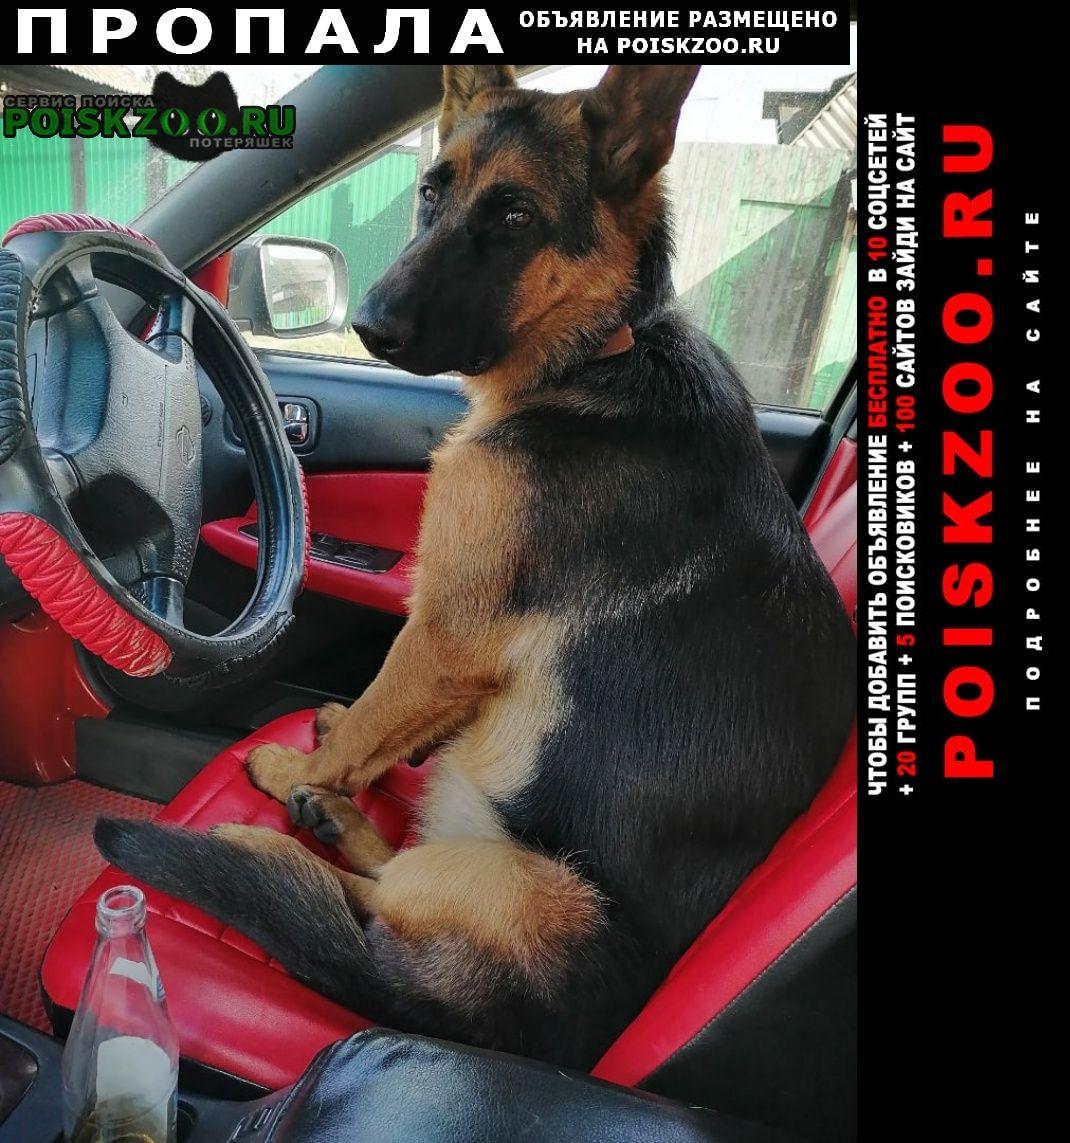 Пропала собака немецкая овчарка Абакан Хакасия